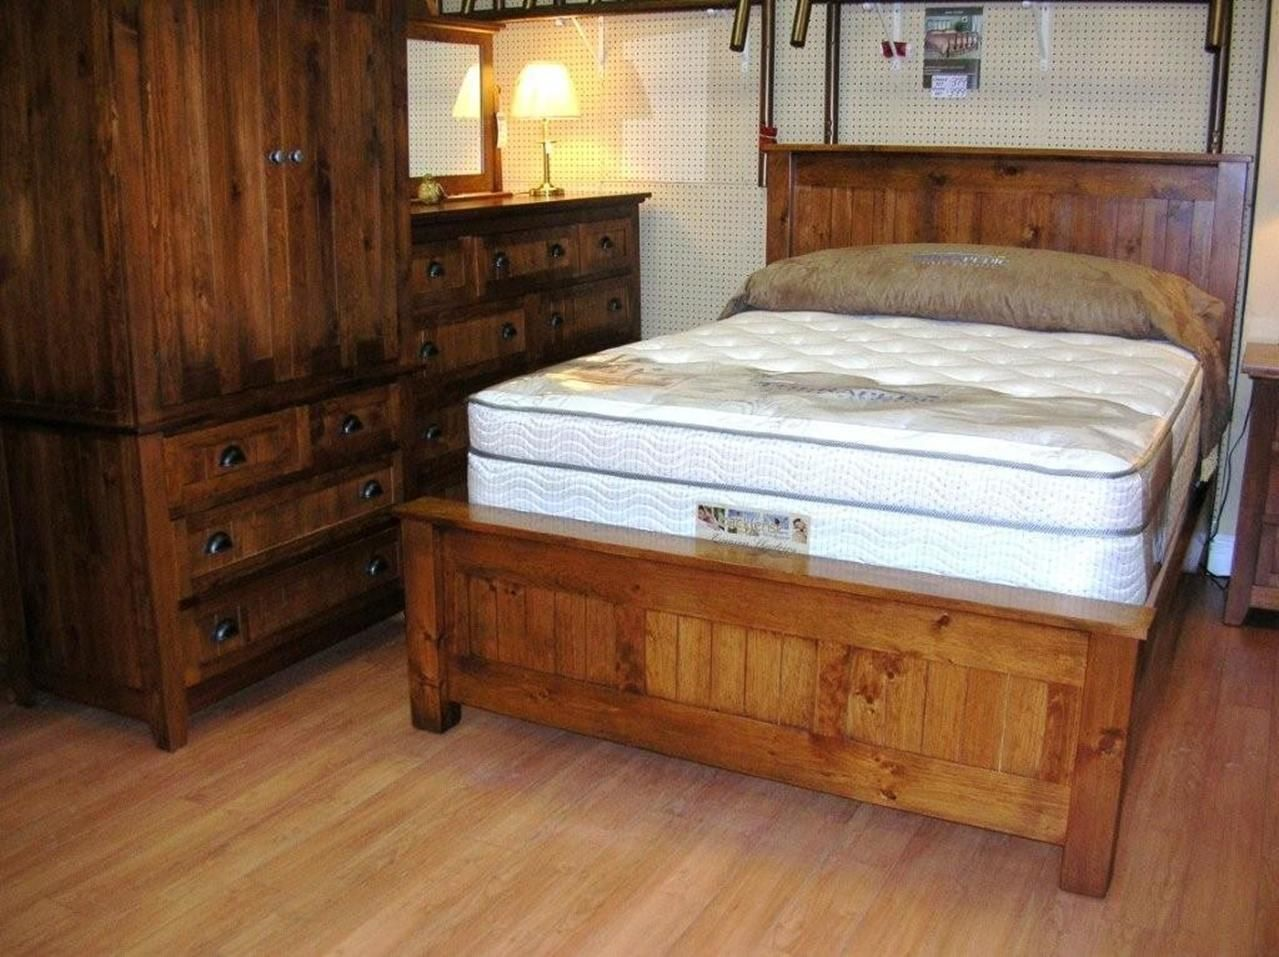 Rustic Wood Bedroom Furniture 36 #palletbedroomfurniture